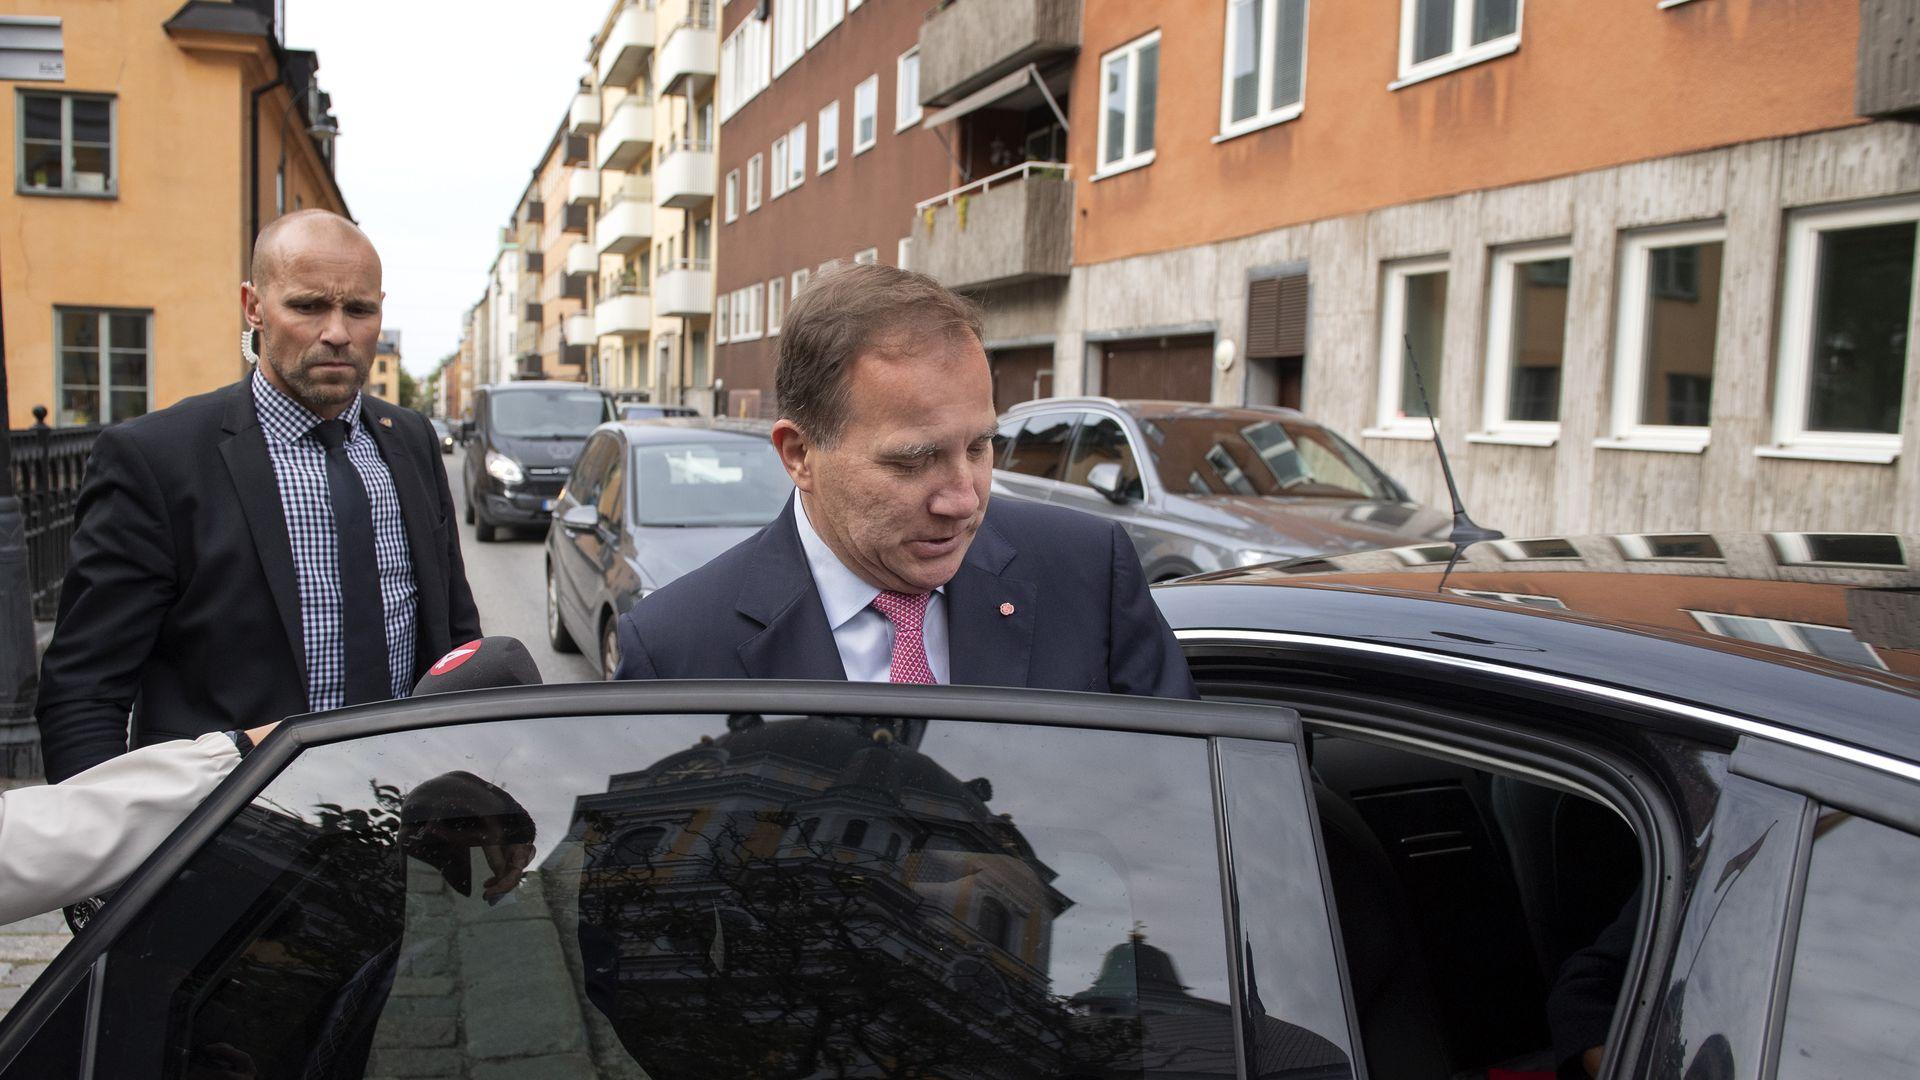 Swedish PM Stefan Löfven